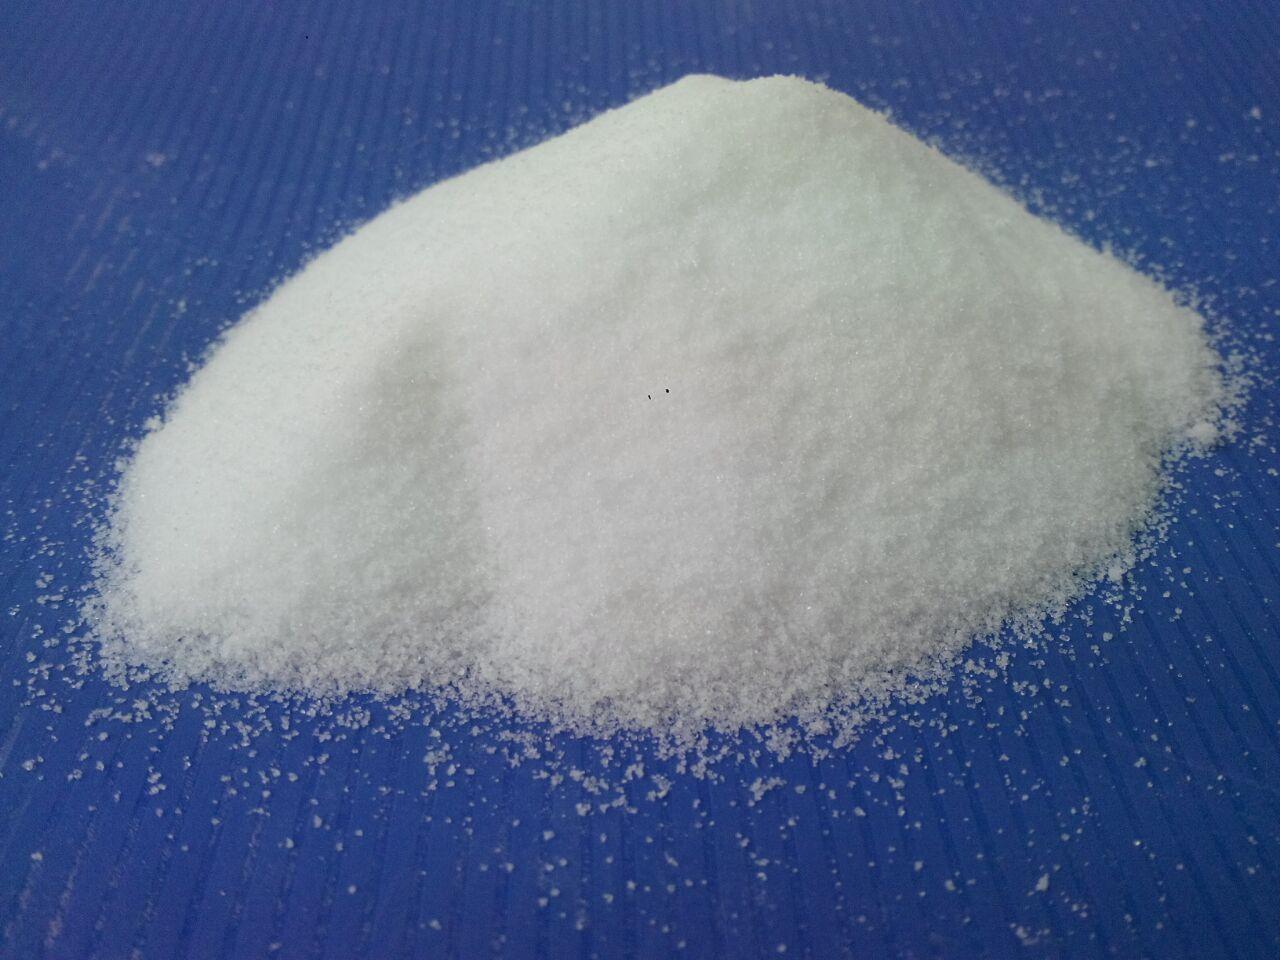 Pharma Grade Ammonium Chloride